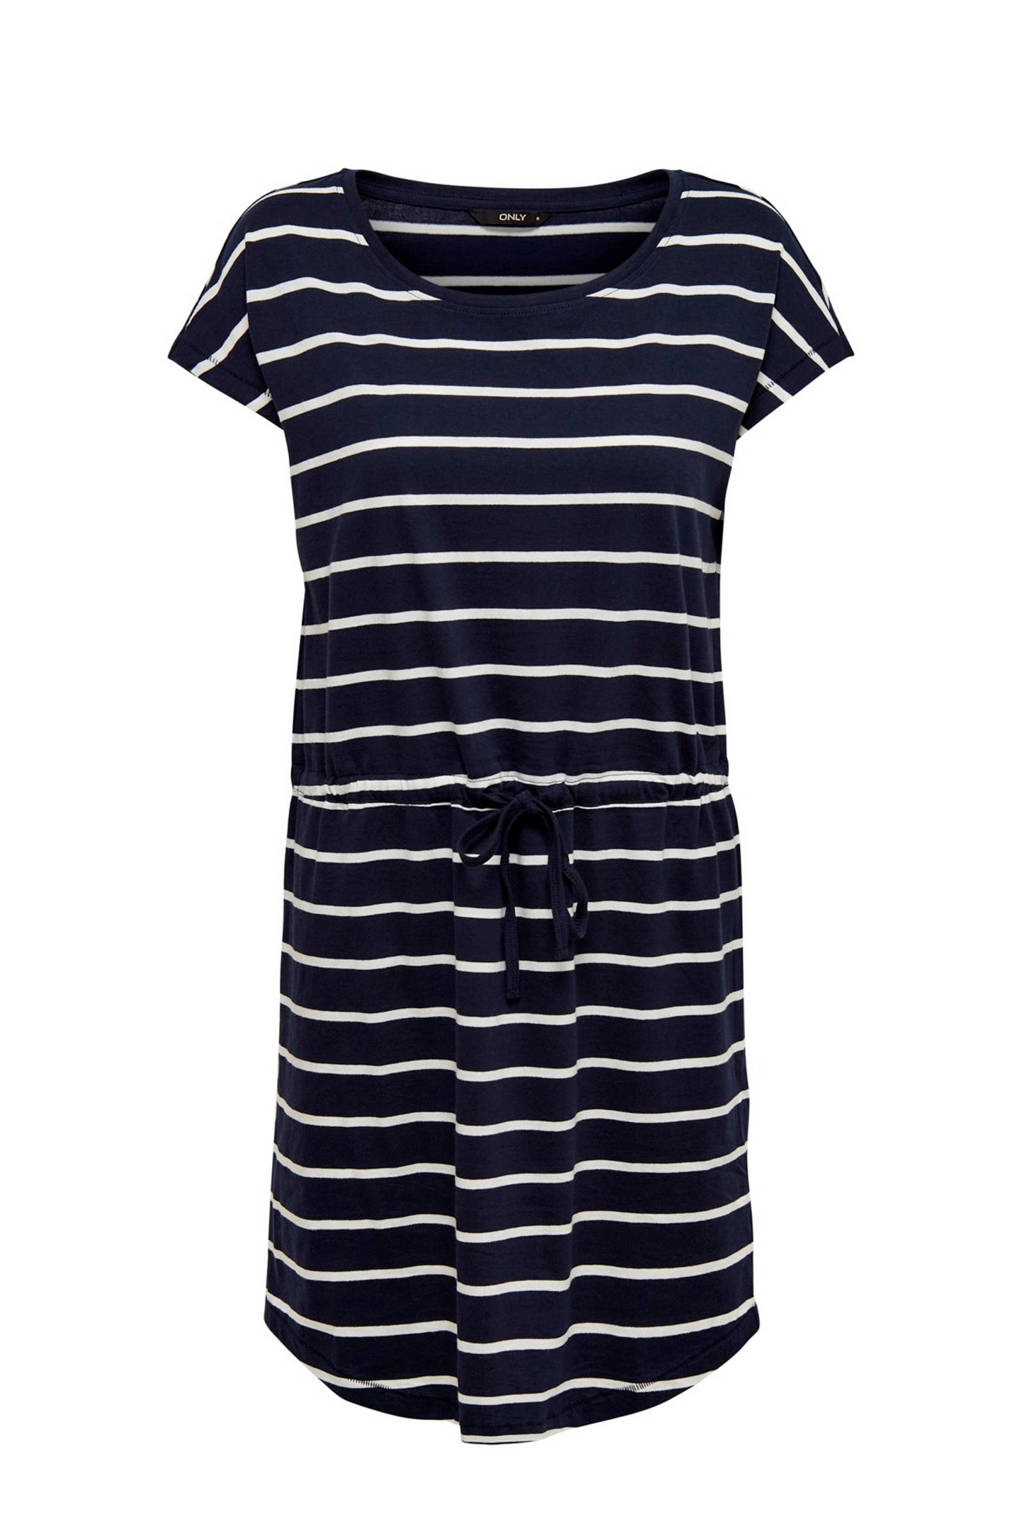 ONLY gestreepte jurk donkerblauw, Donkerblauw/wit